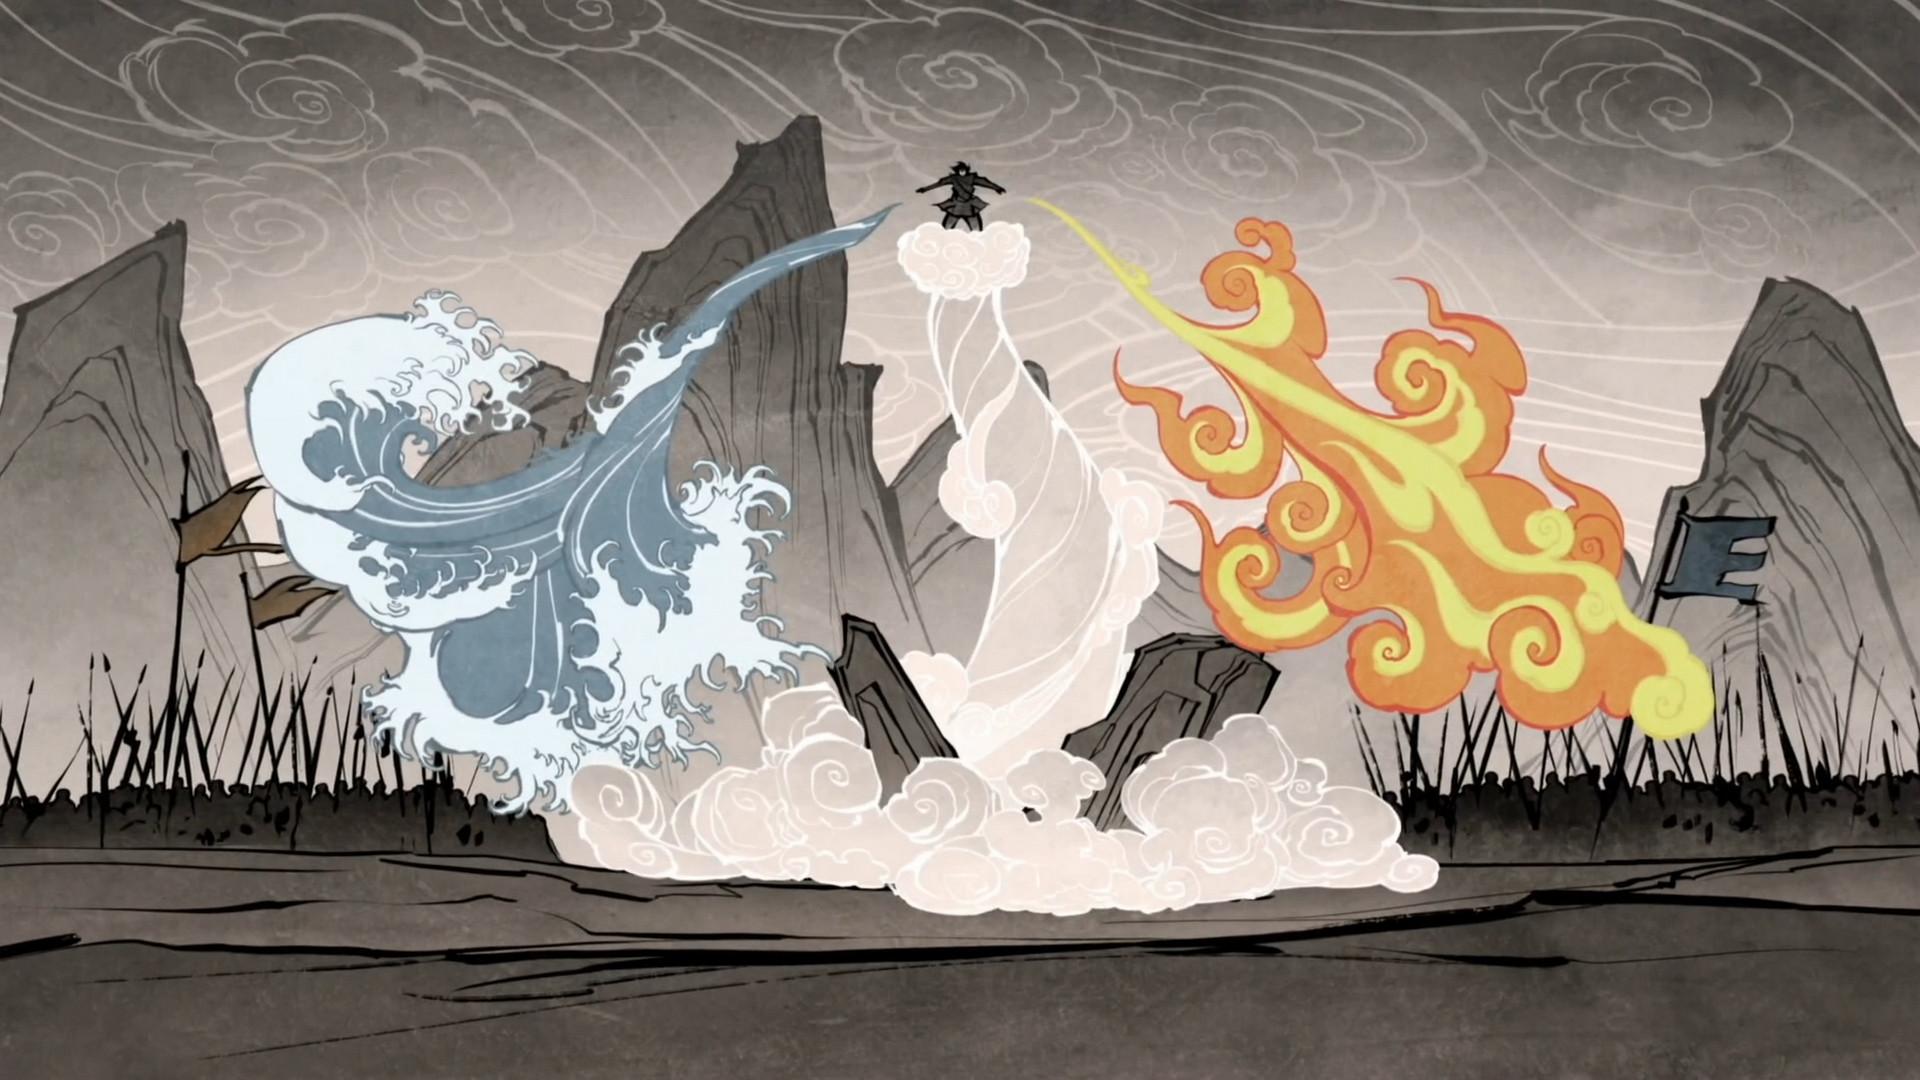 Avatar The Legend Of Korra HD Wallpaper Background Image 1920x1080